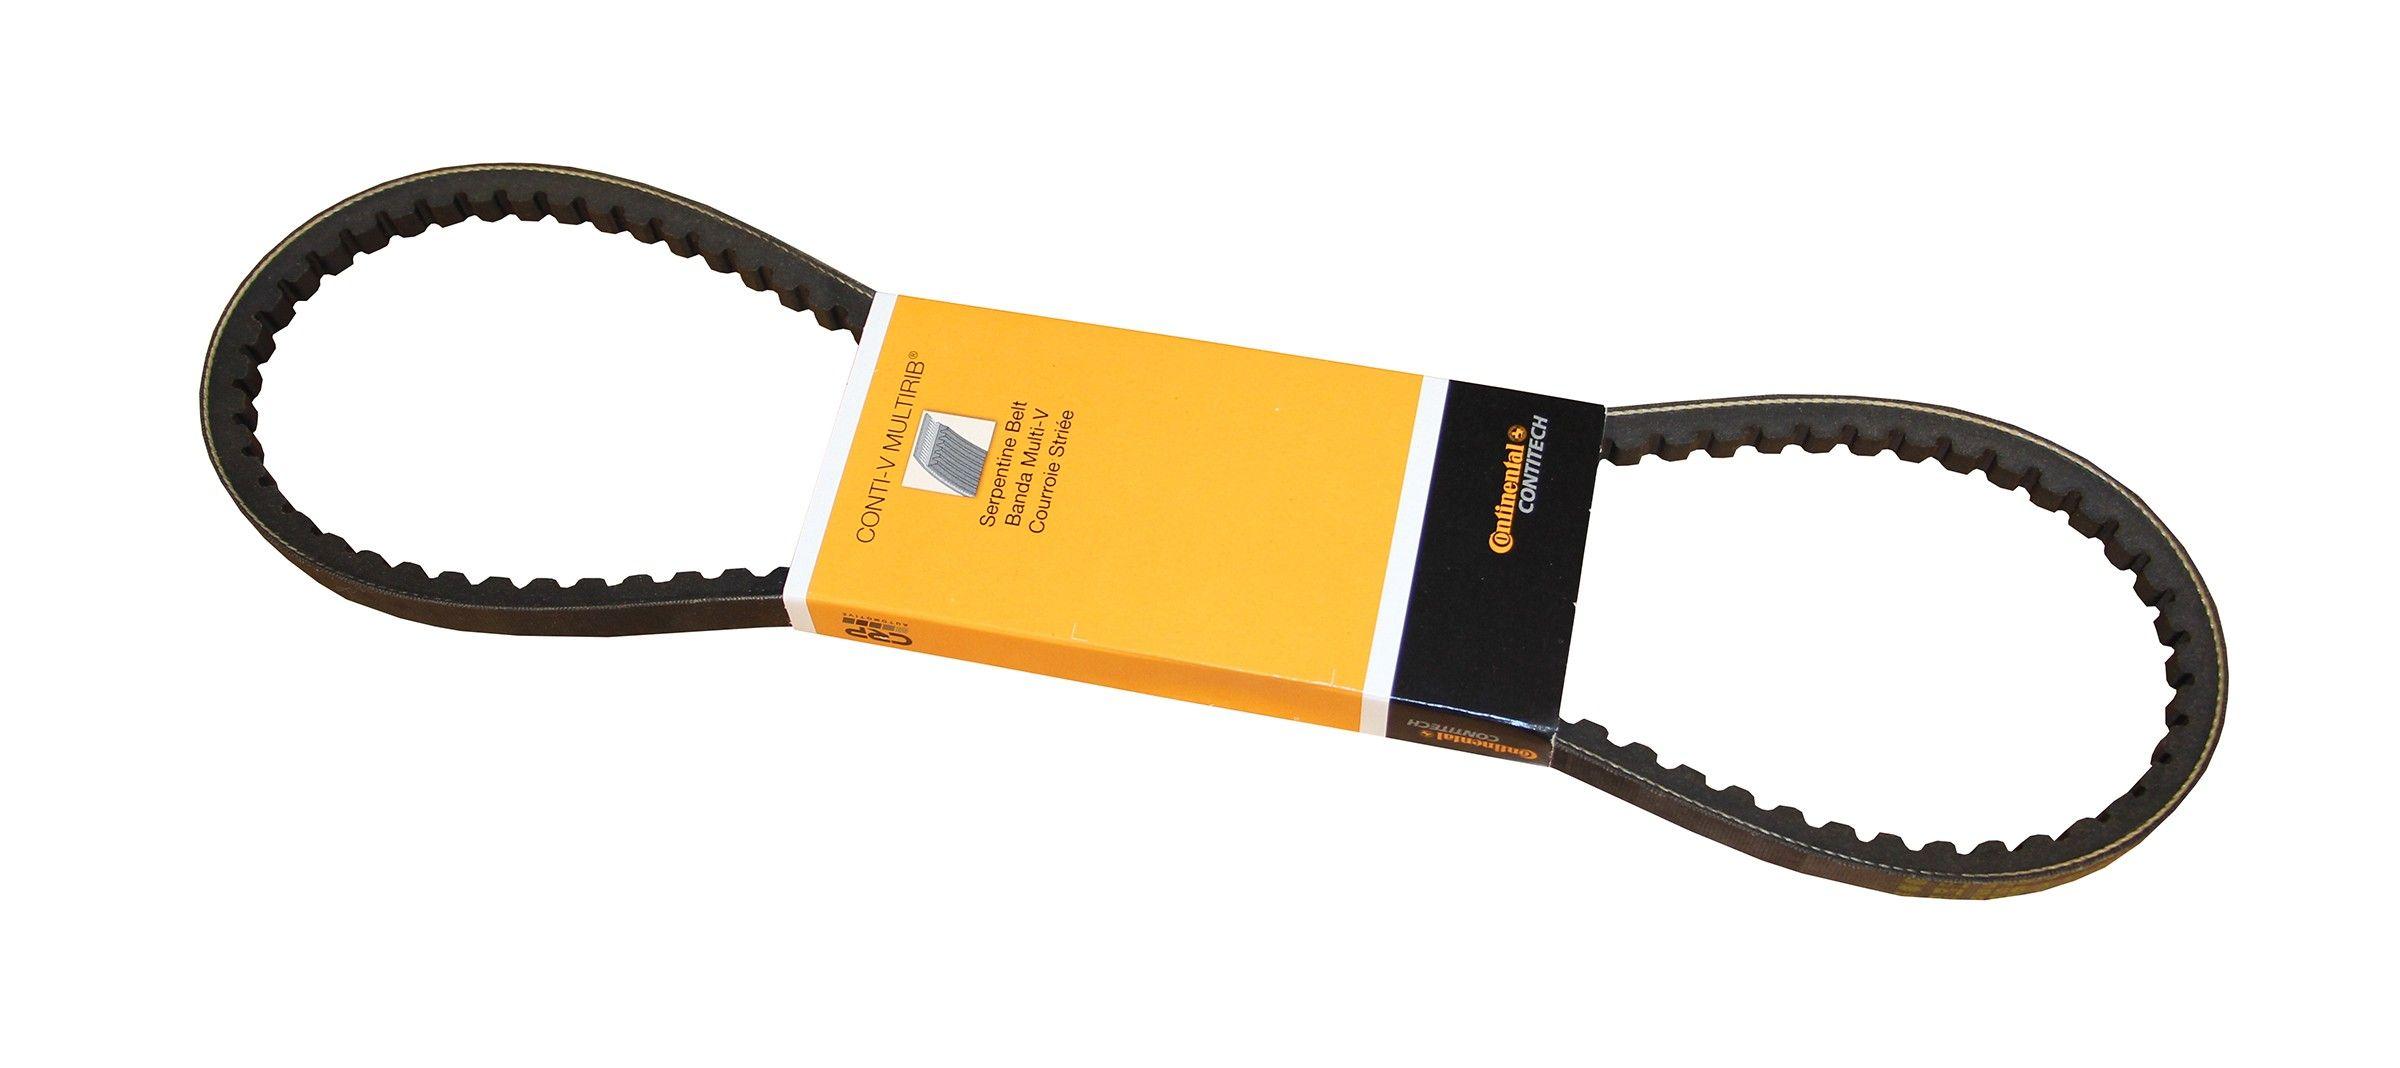 Auto 7 300-0040 Power Steering Pump Belt